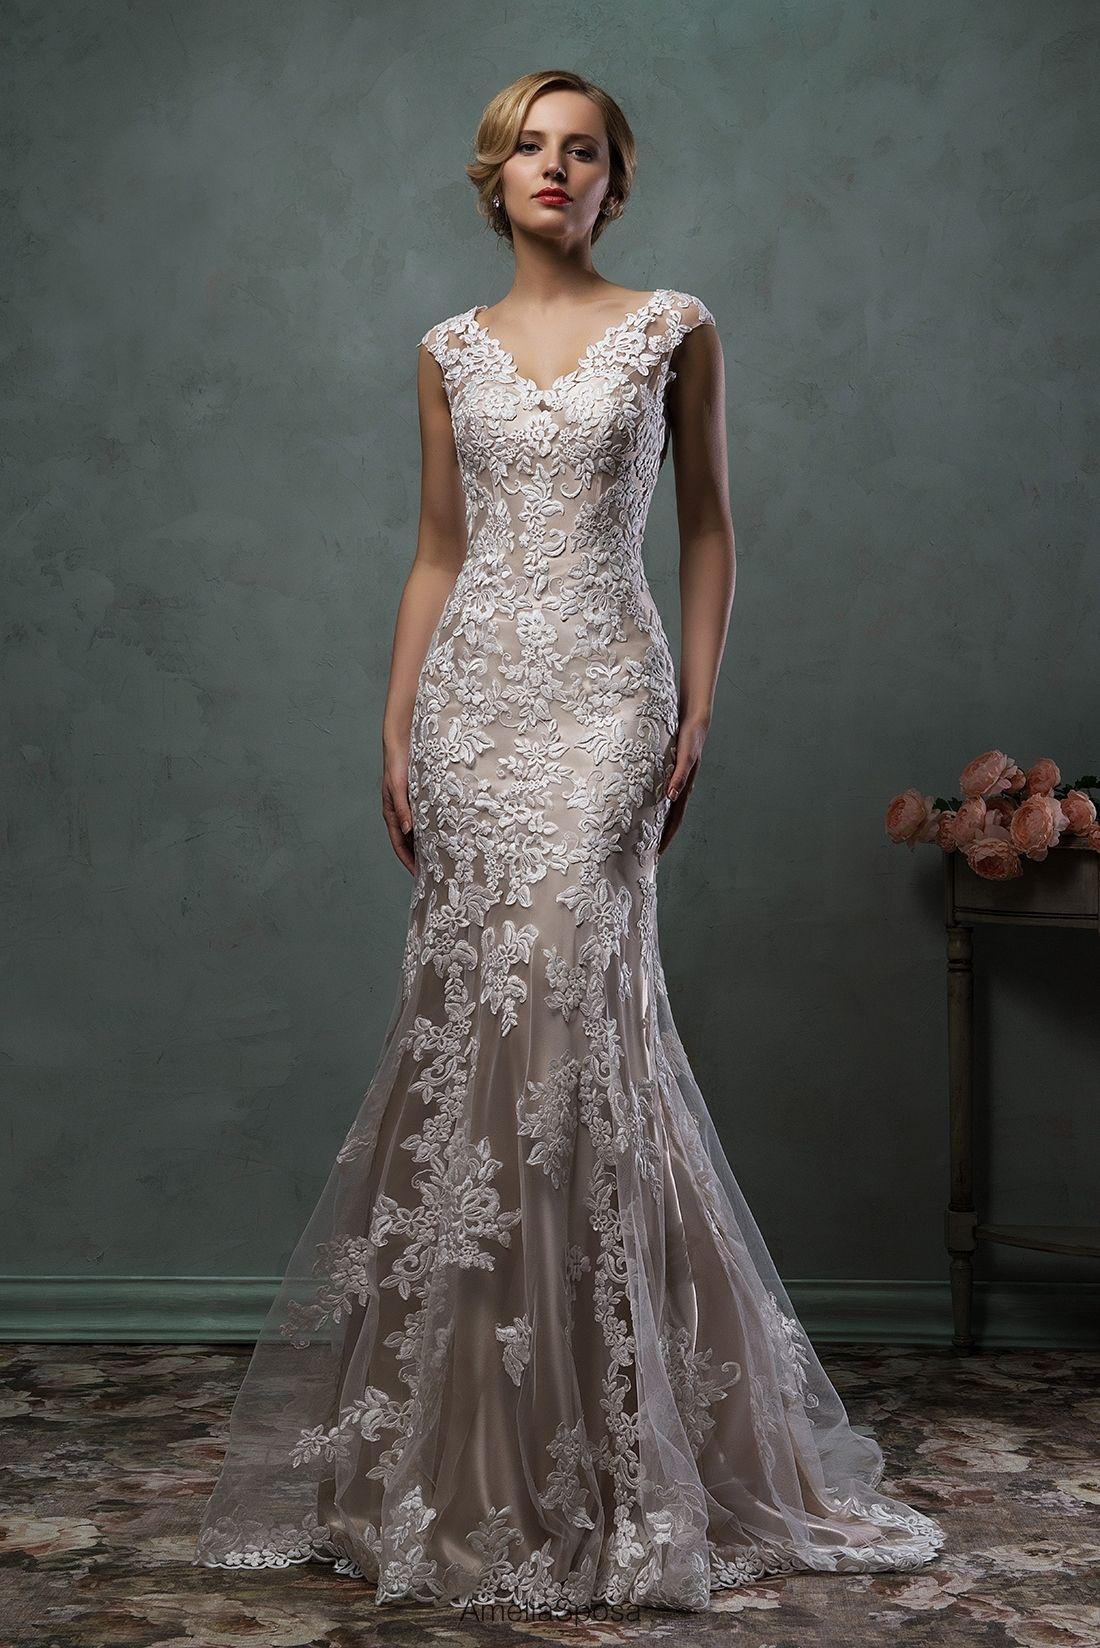 Wedding Dress Alba By Amelia Sposa Amelia Sposa Wedding Dress Wedding Dresses Wedding Dress Cap Sleeves